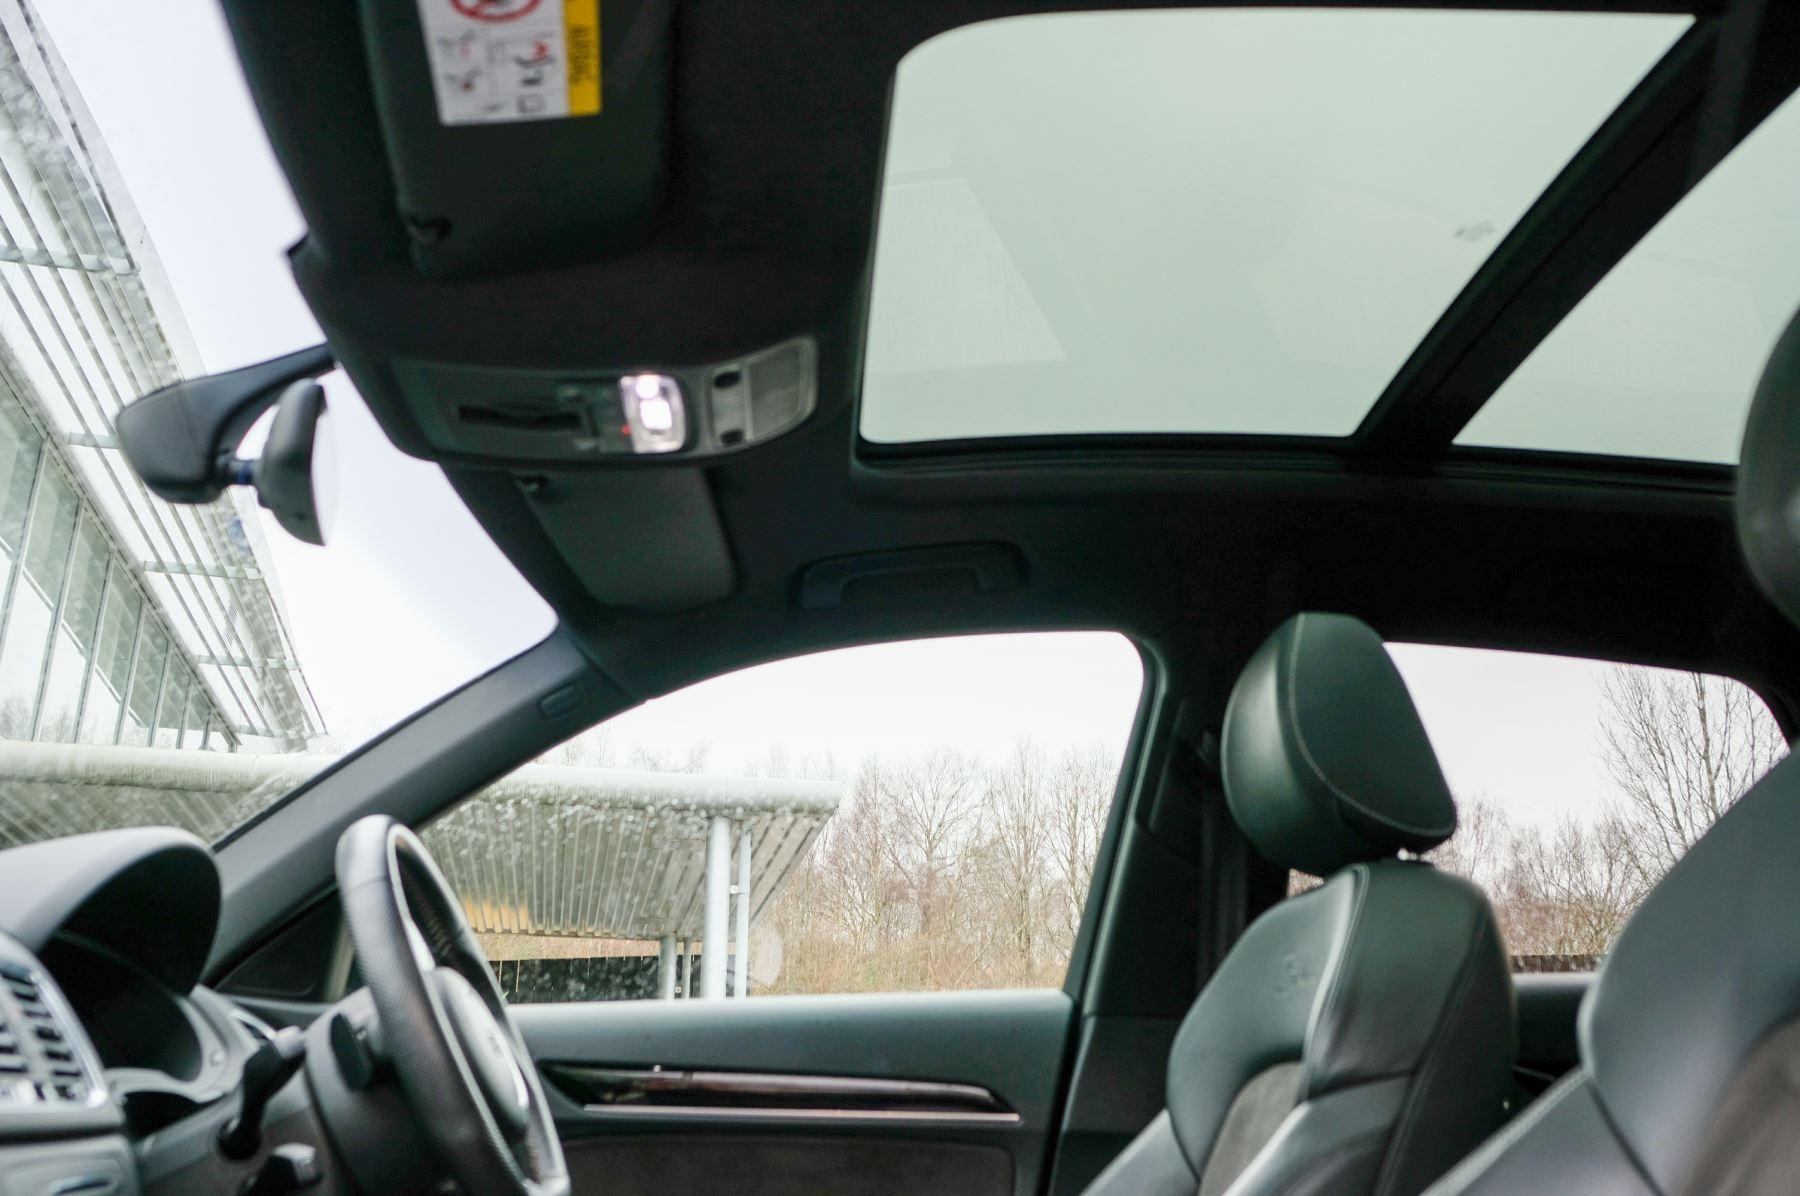 Audi Q3 2.0T FSI Quattro Black Edition 5dr S Tronic - Panoramic glass sunroof image 21